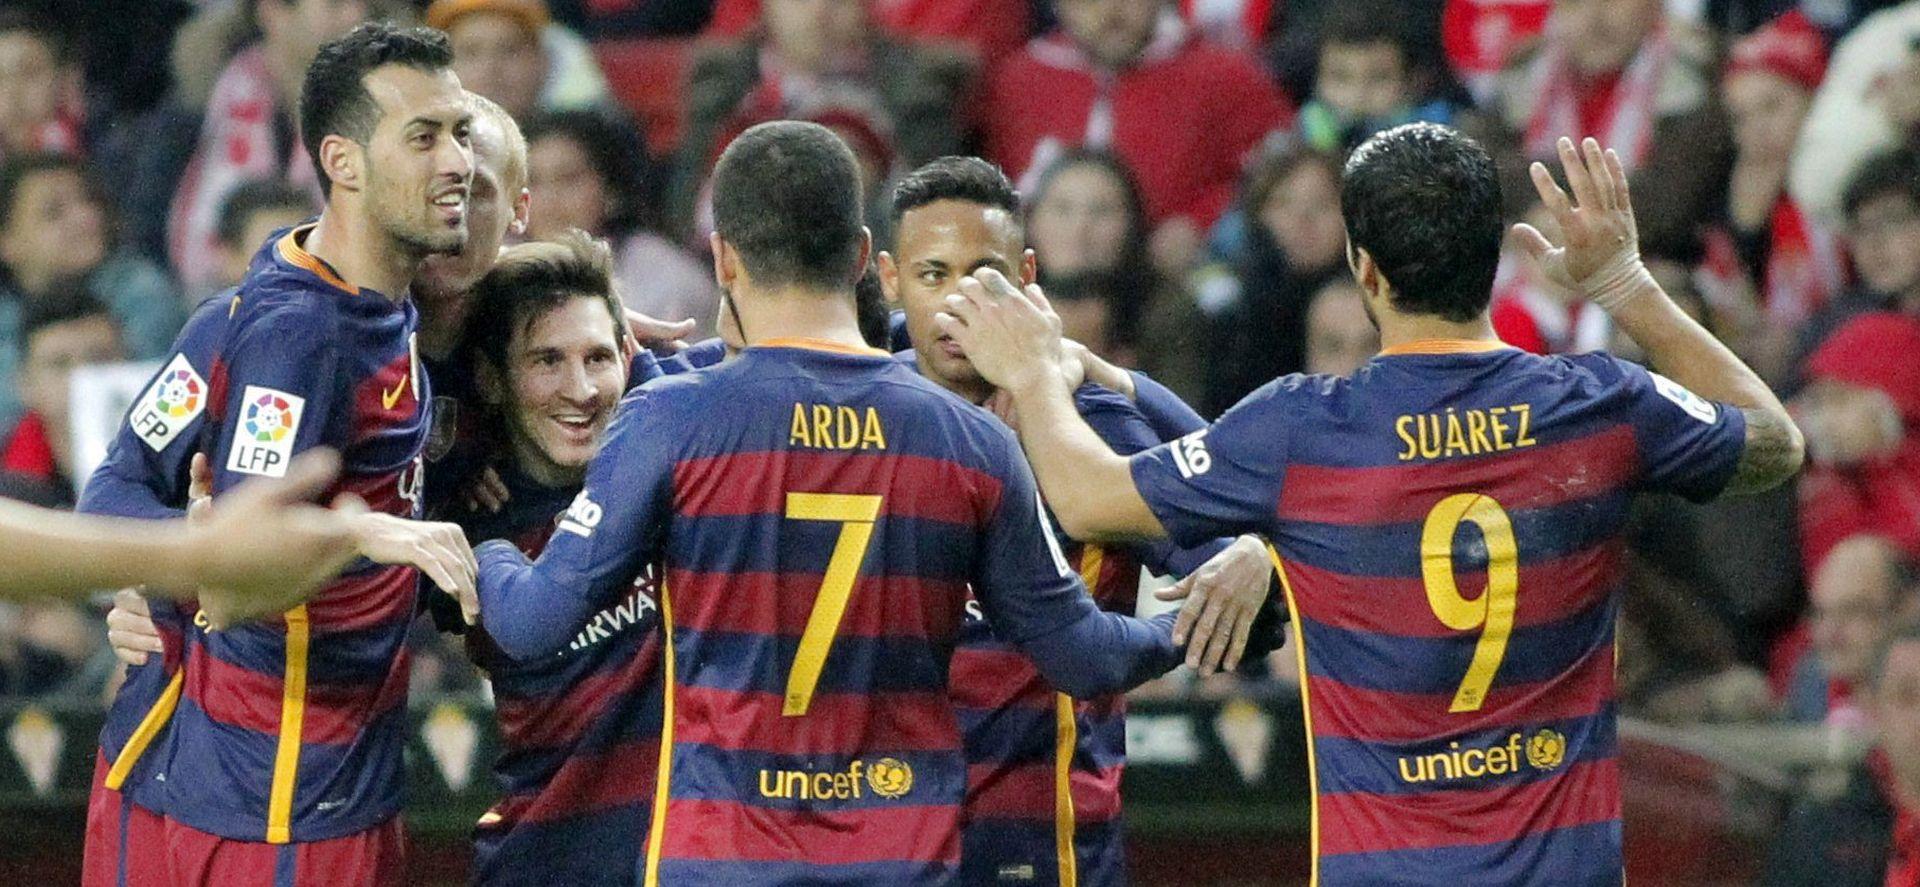 MESSI JUNAK DVOBOJA: Sporting – Barcelona 1-3